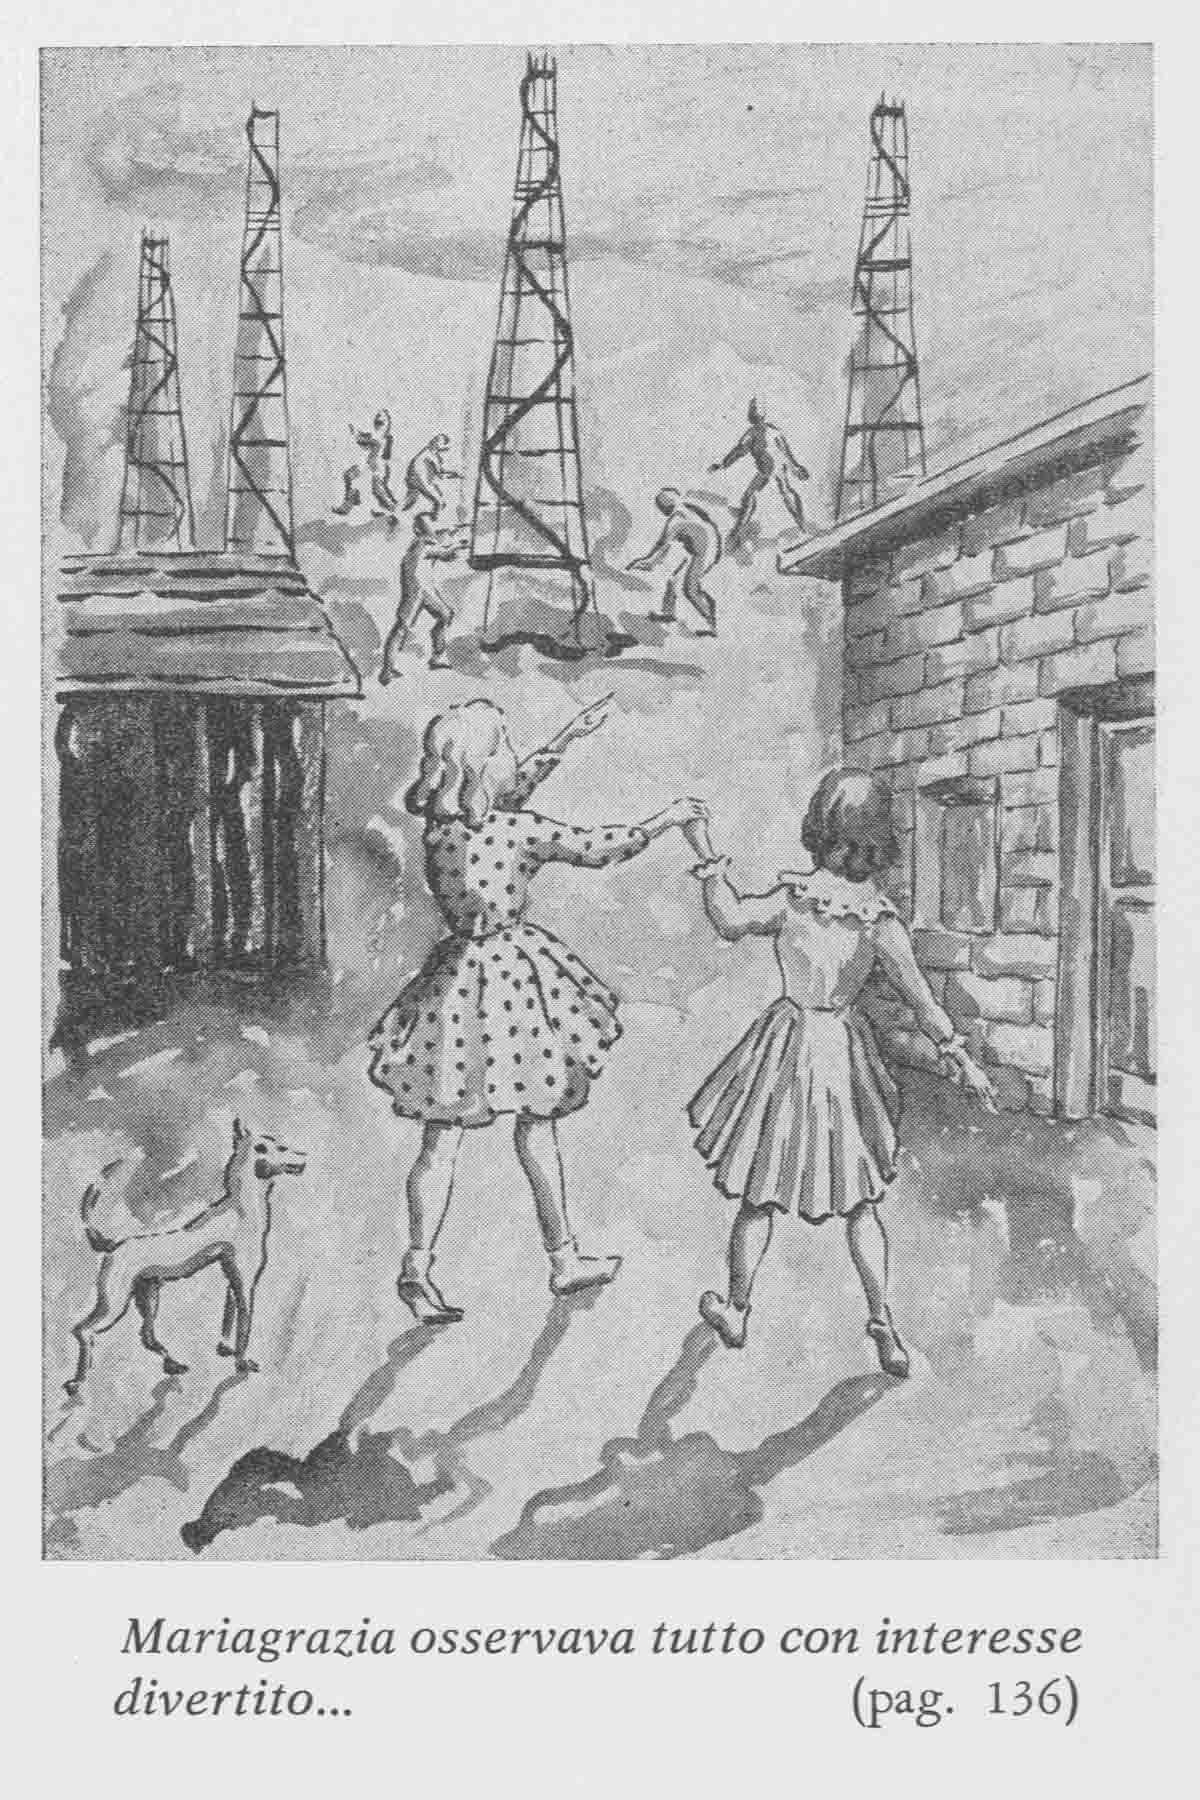 Gonz.A.00.02804 illustrazione a pagina 137.jpg